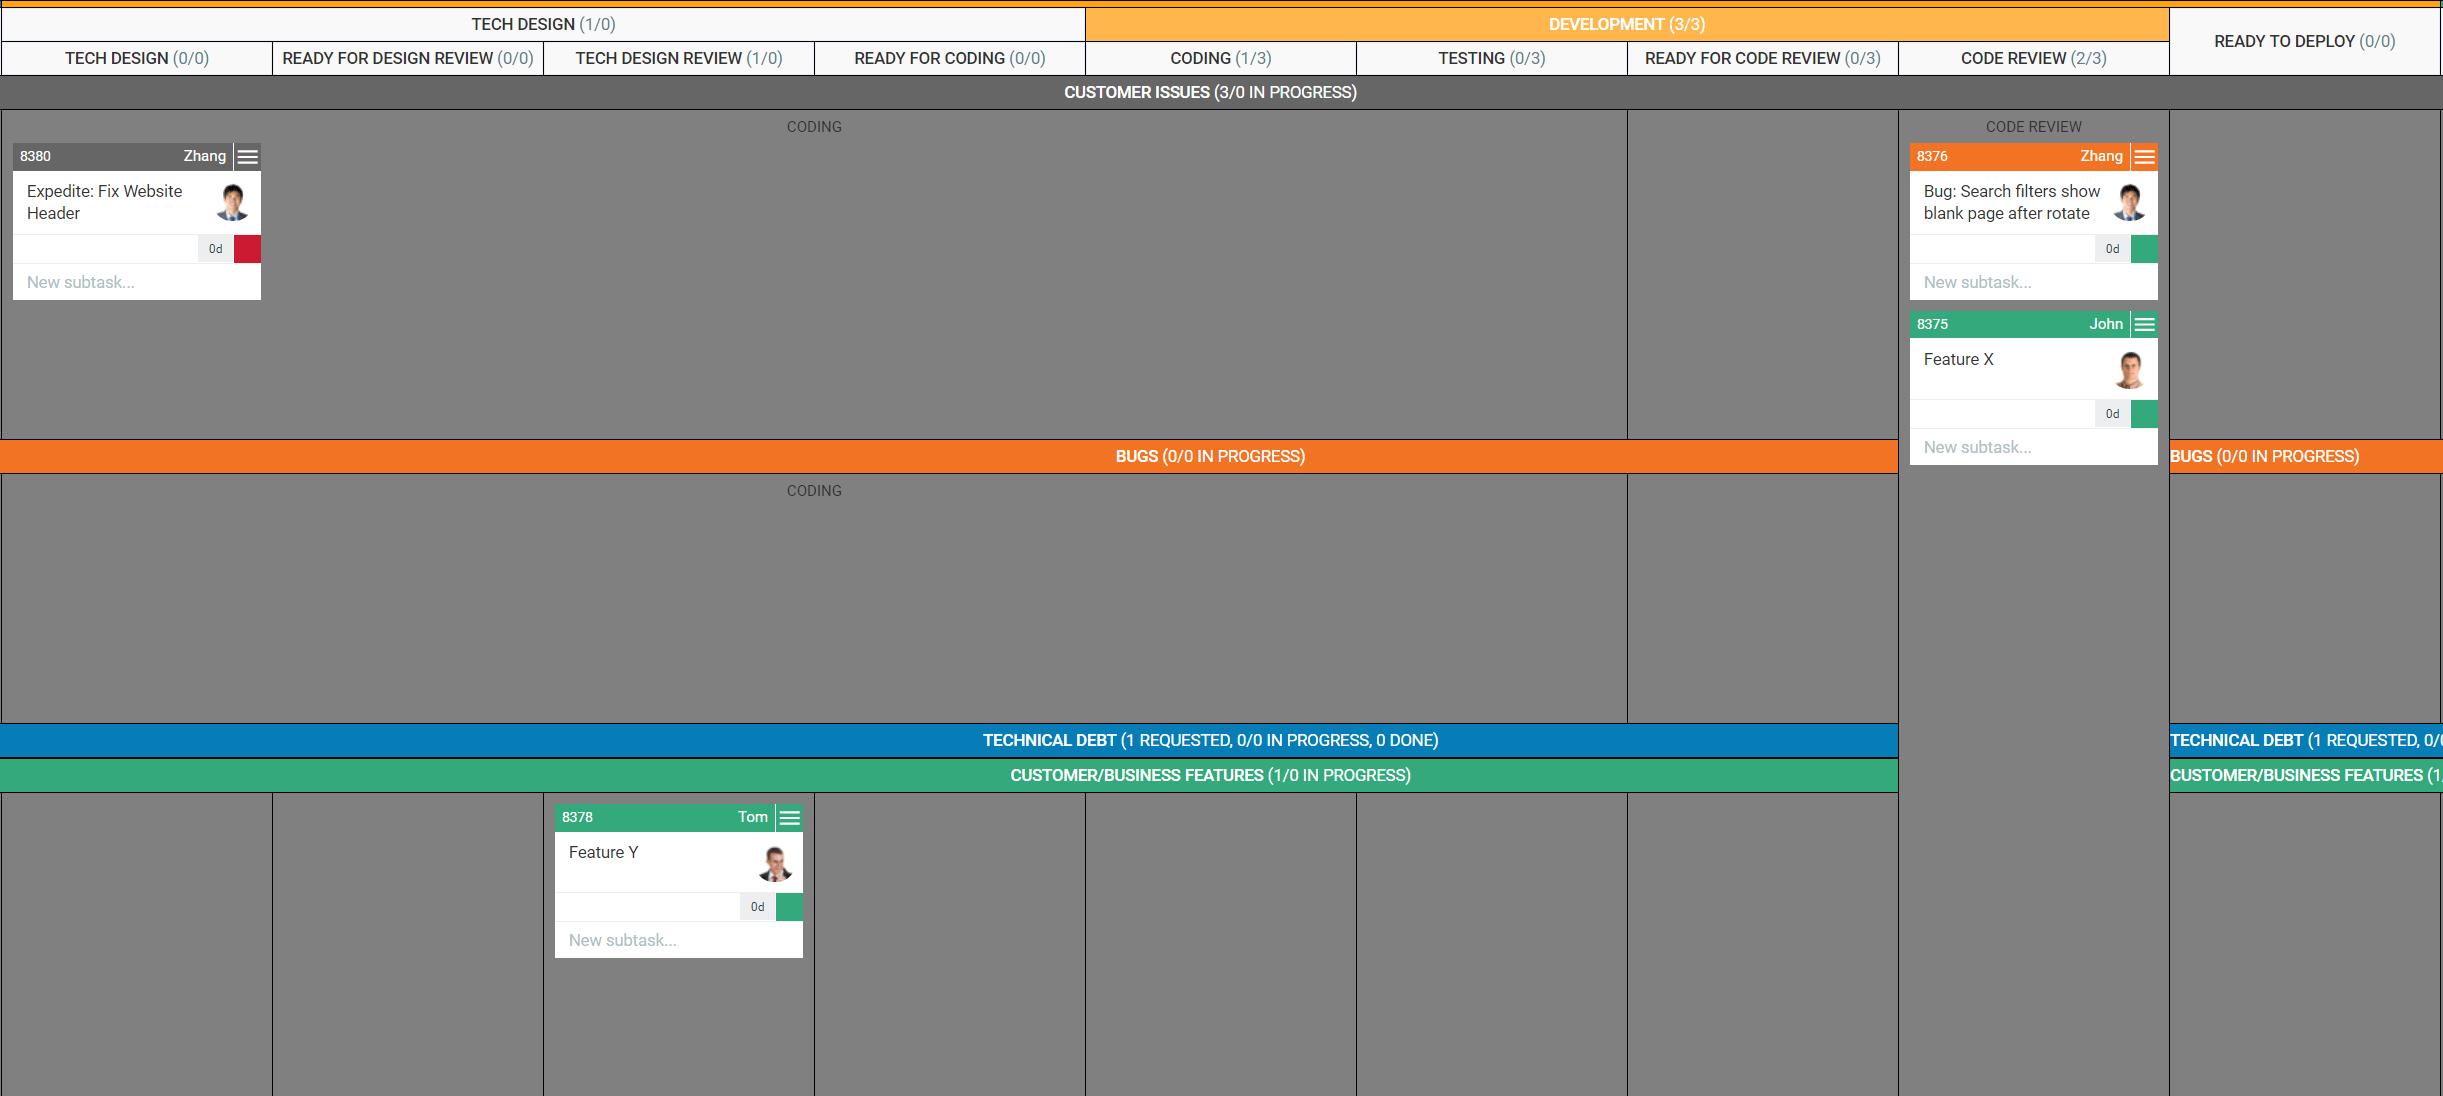 Flexible Kanban board layout in Kanbanize